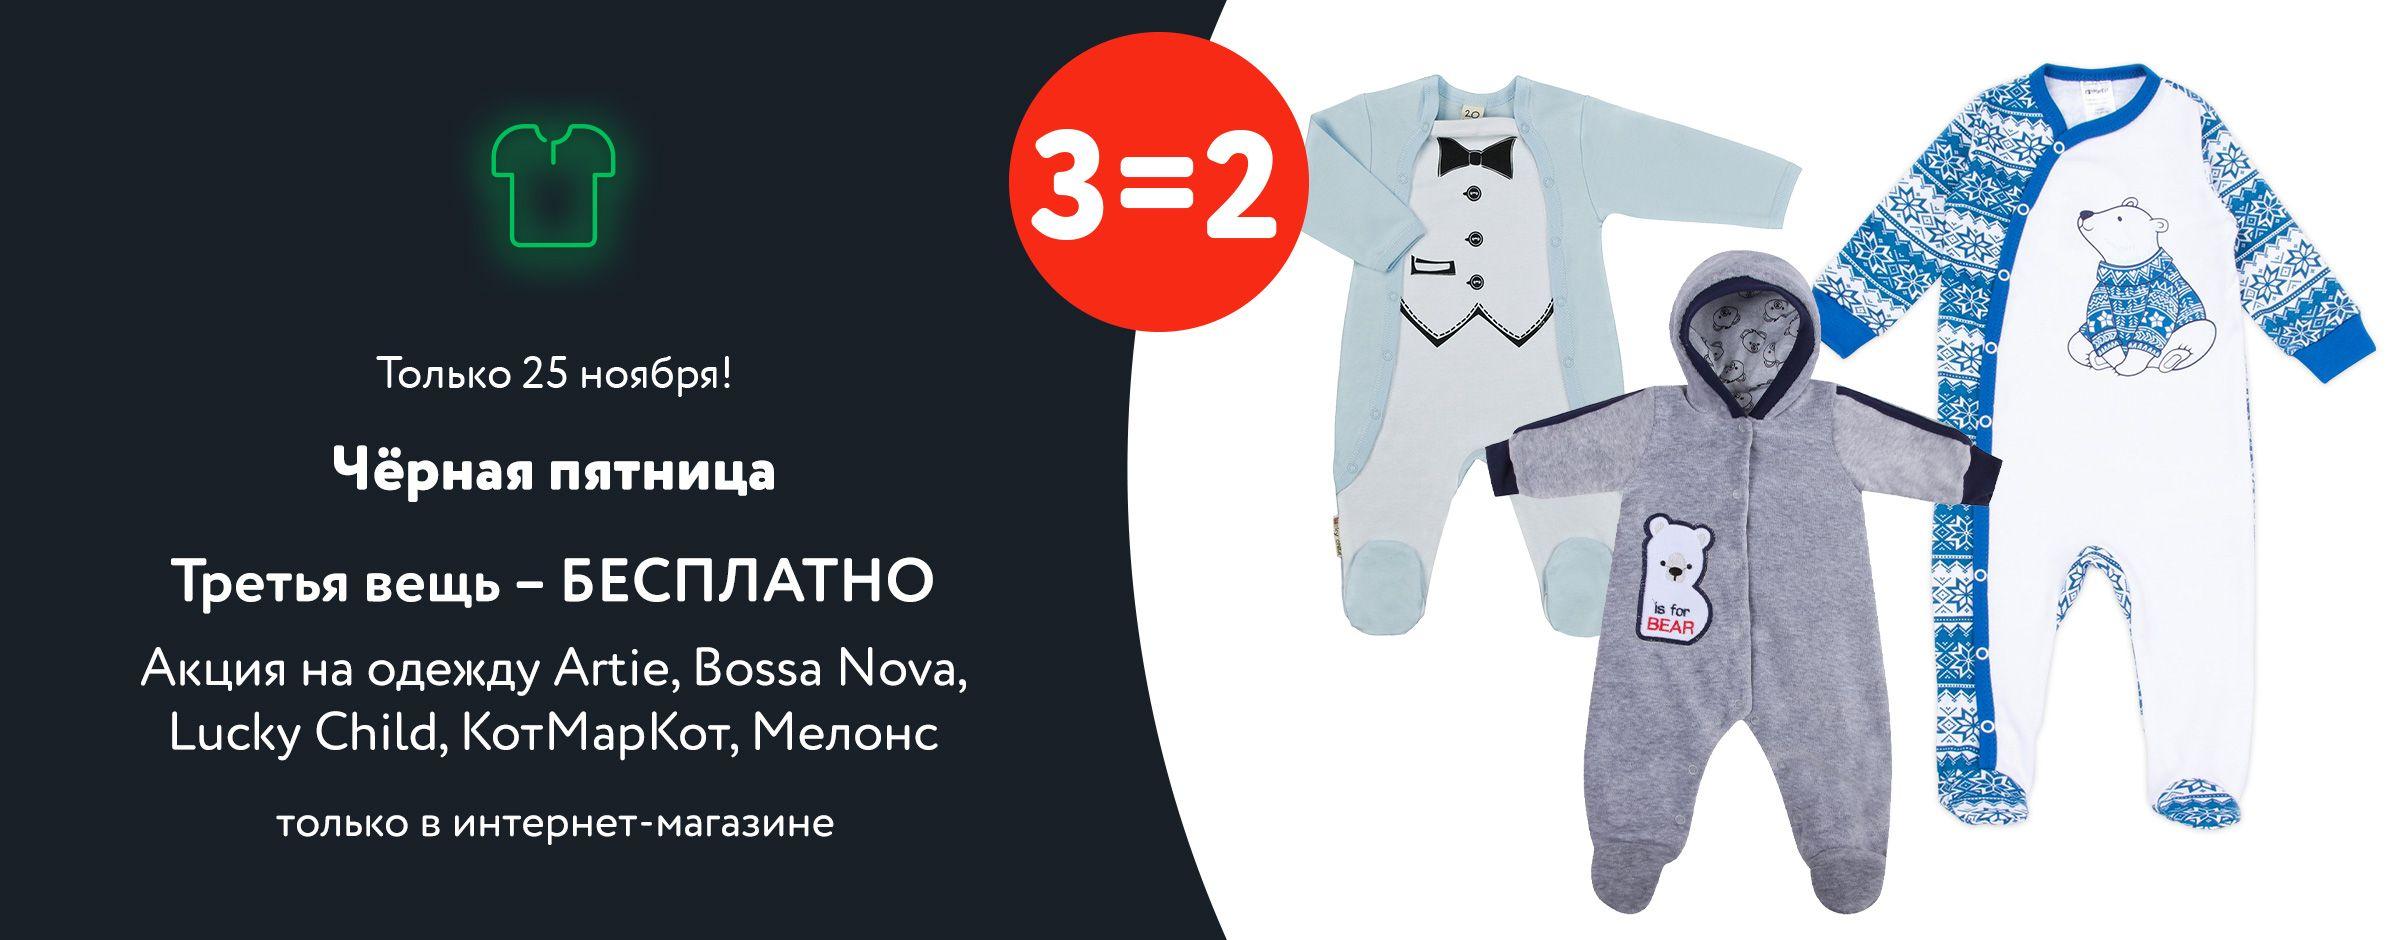 3=2 на одежду МП